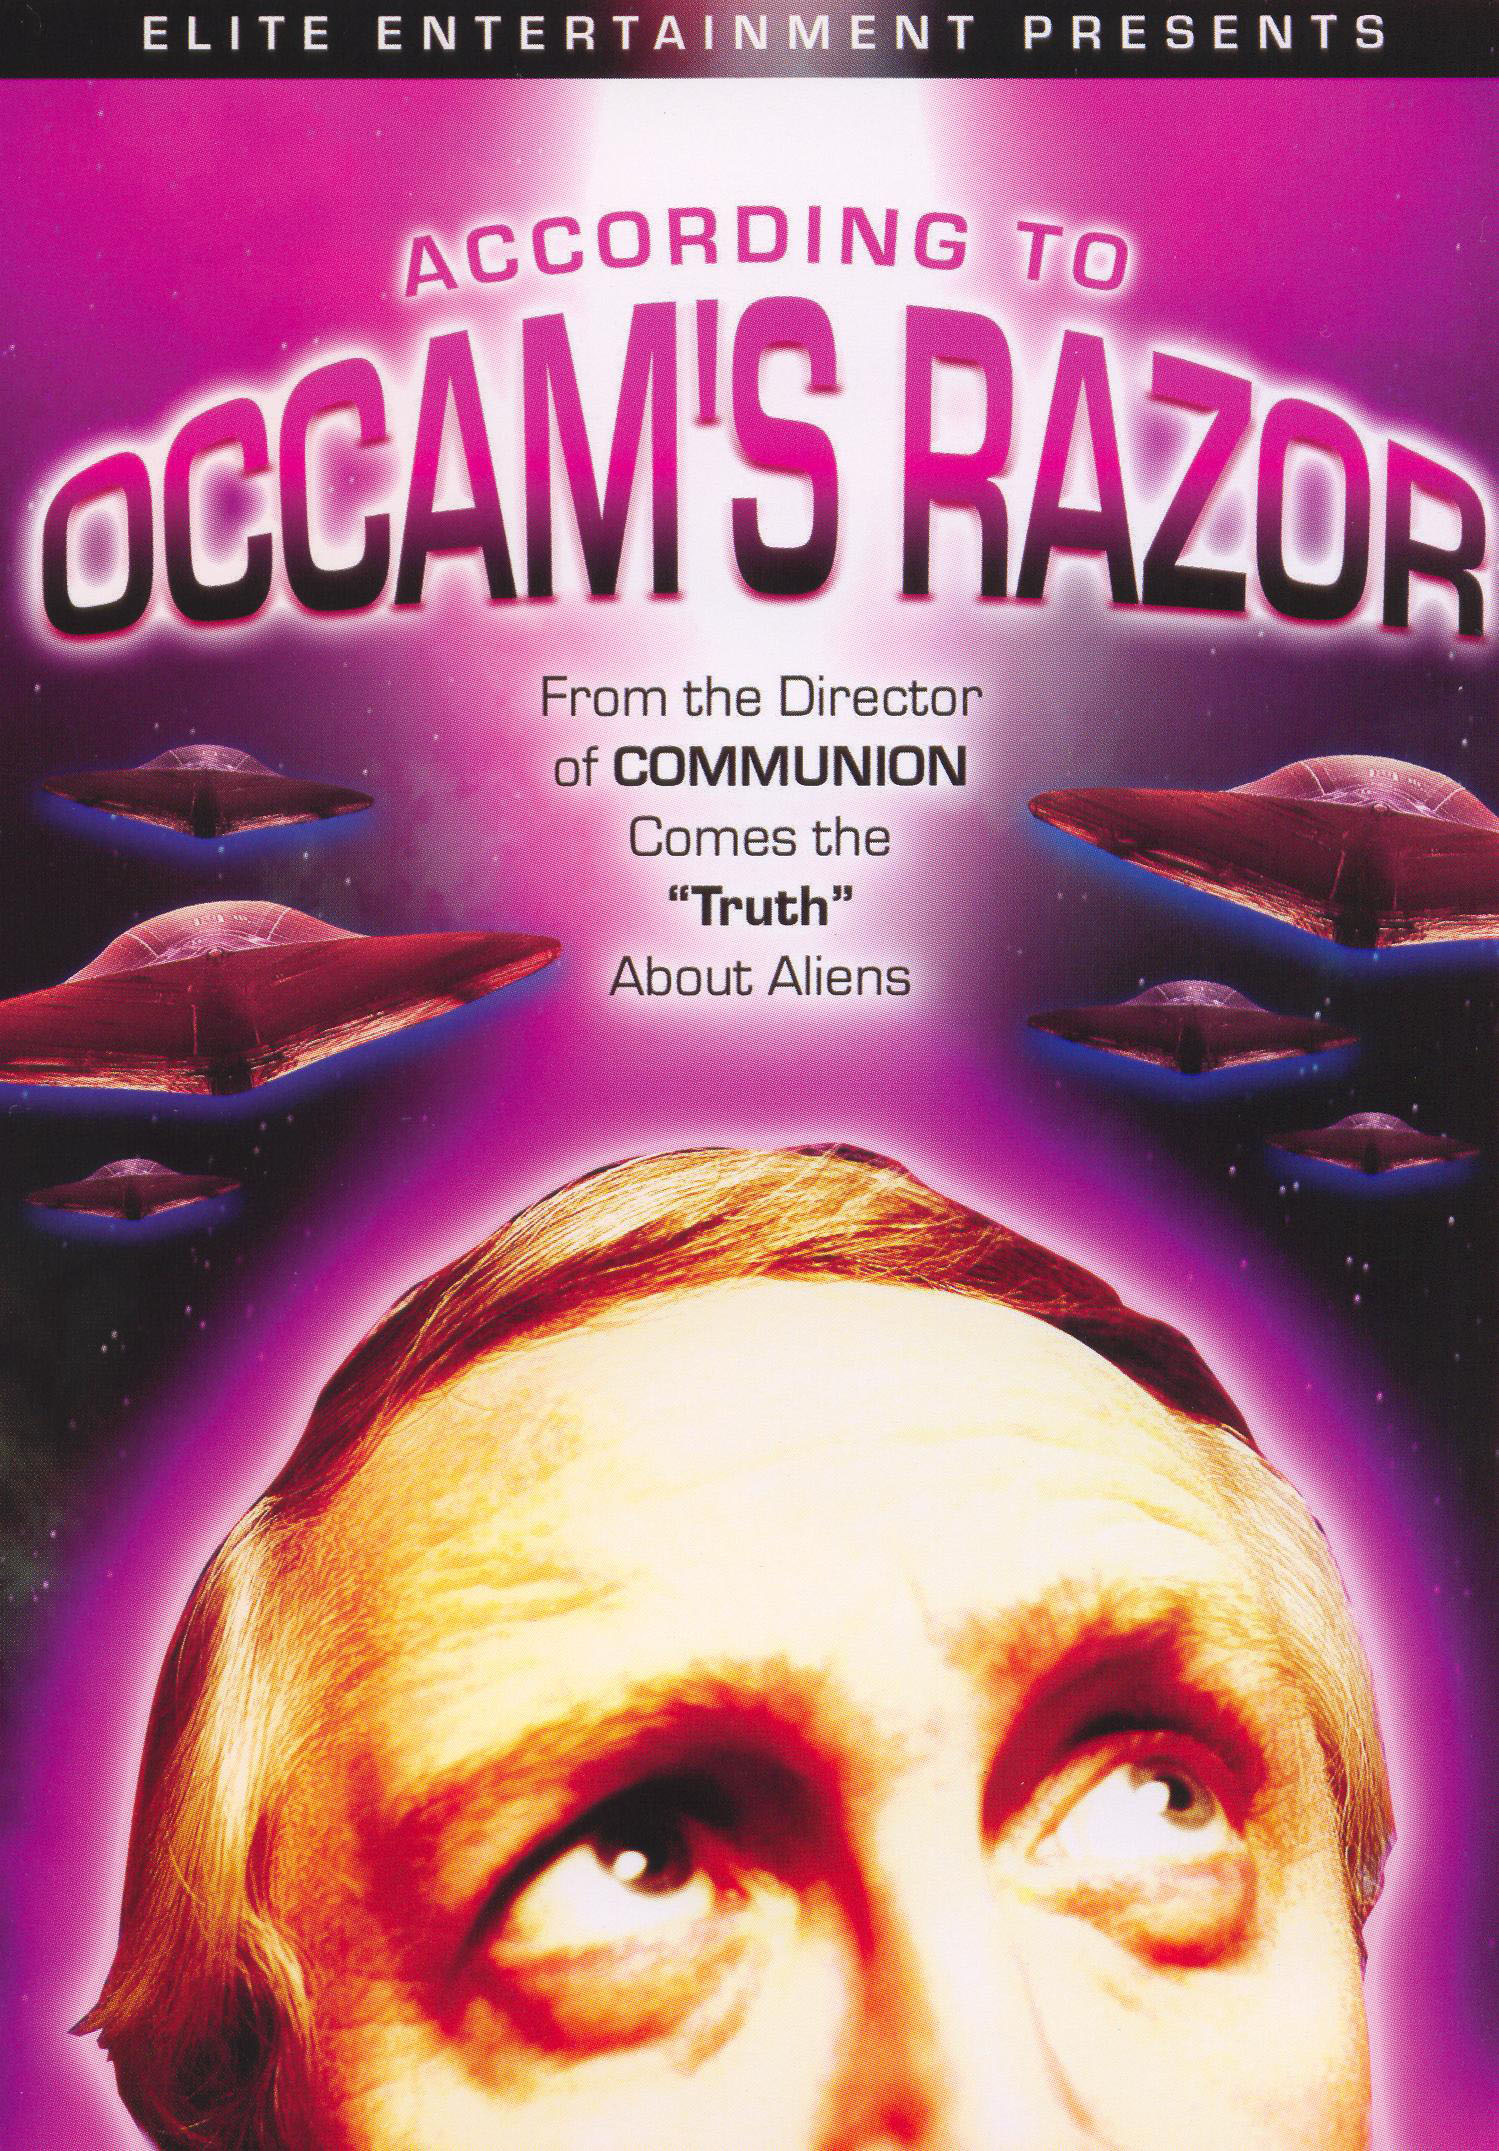 According to Occam's Razor